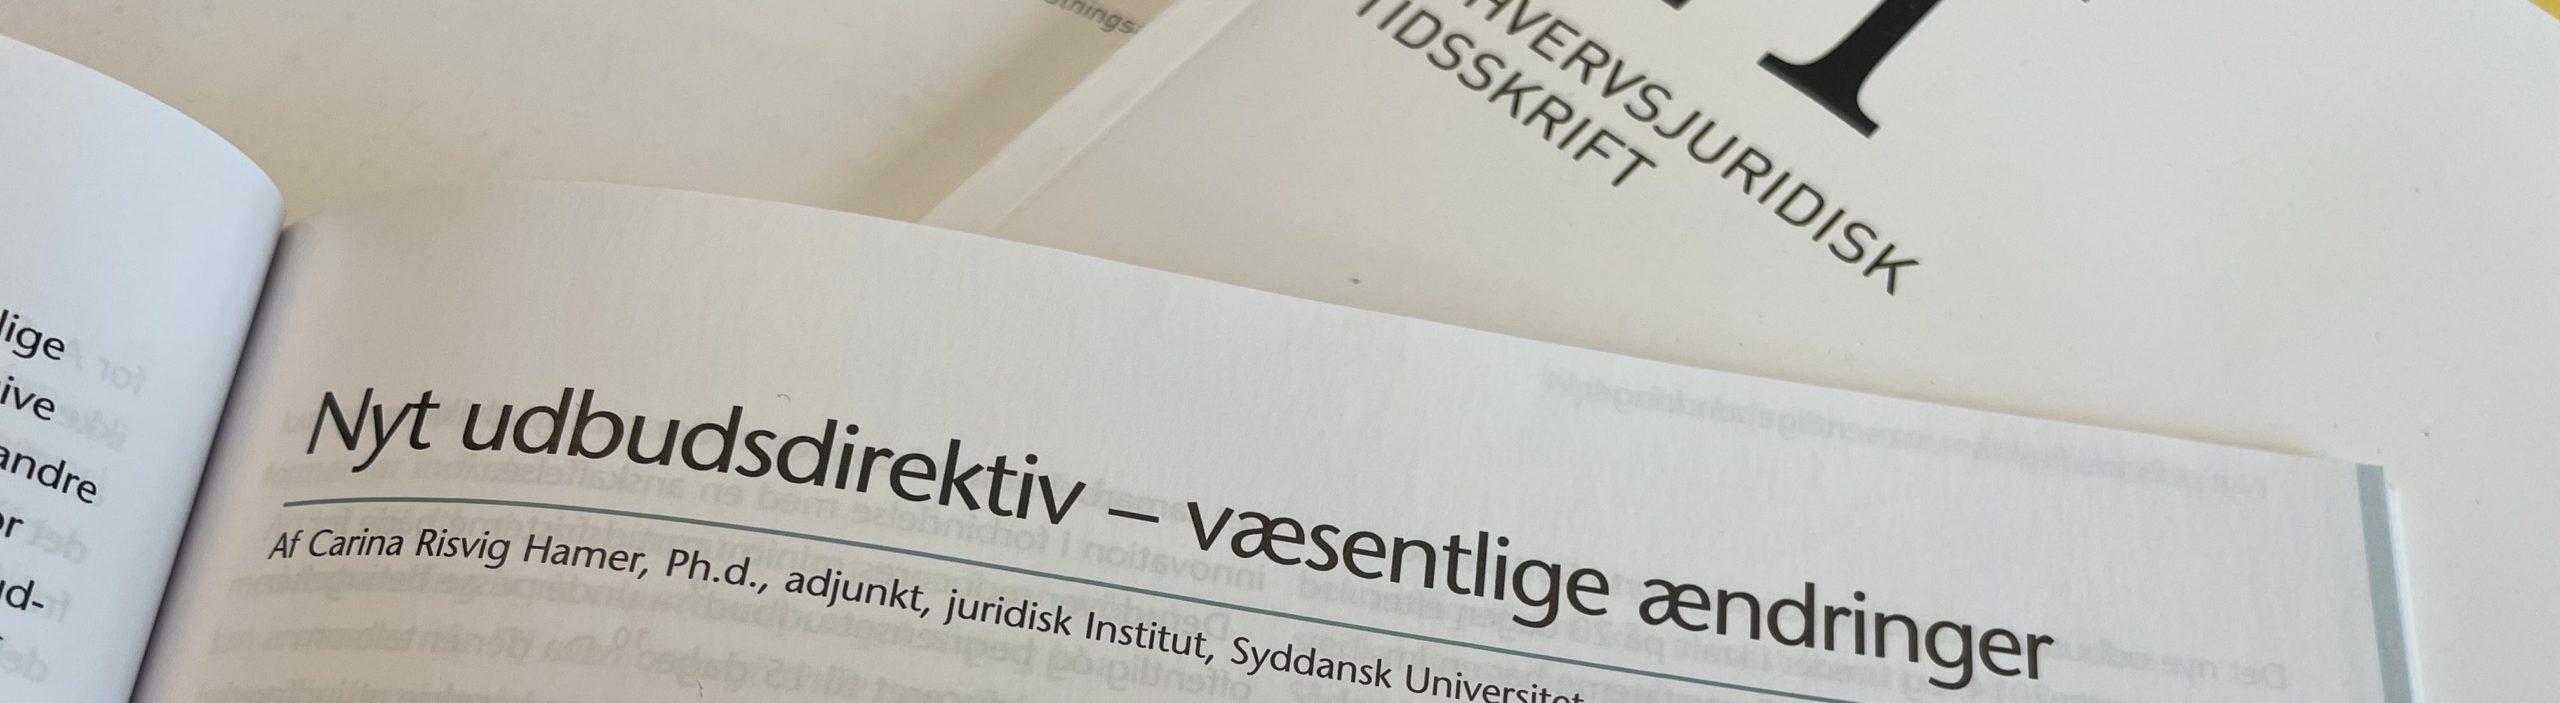 Udbudslov.dk